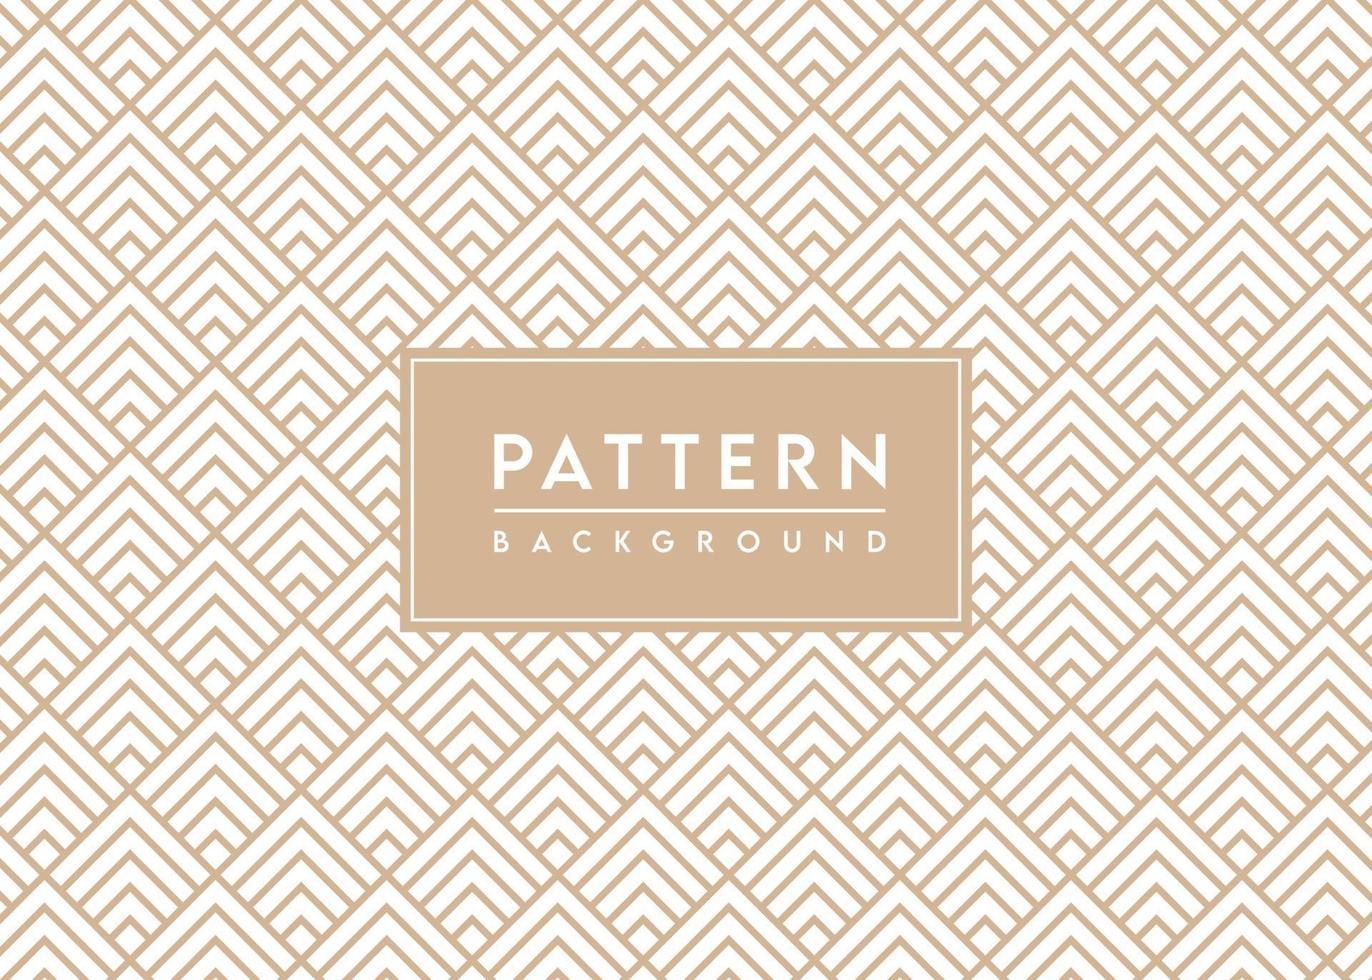 diseño de vector de textura de fondo de patrón de diamante